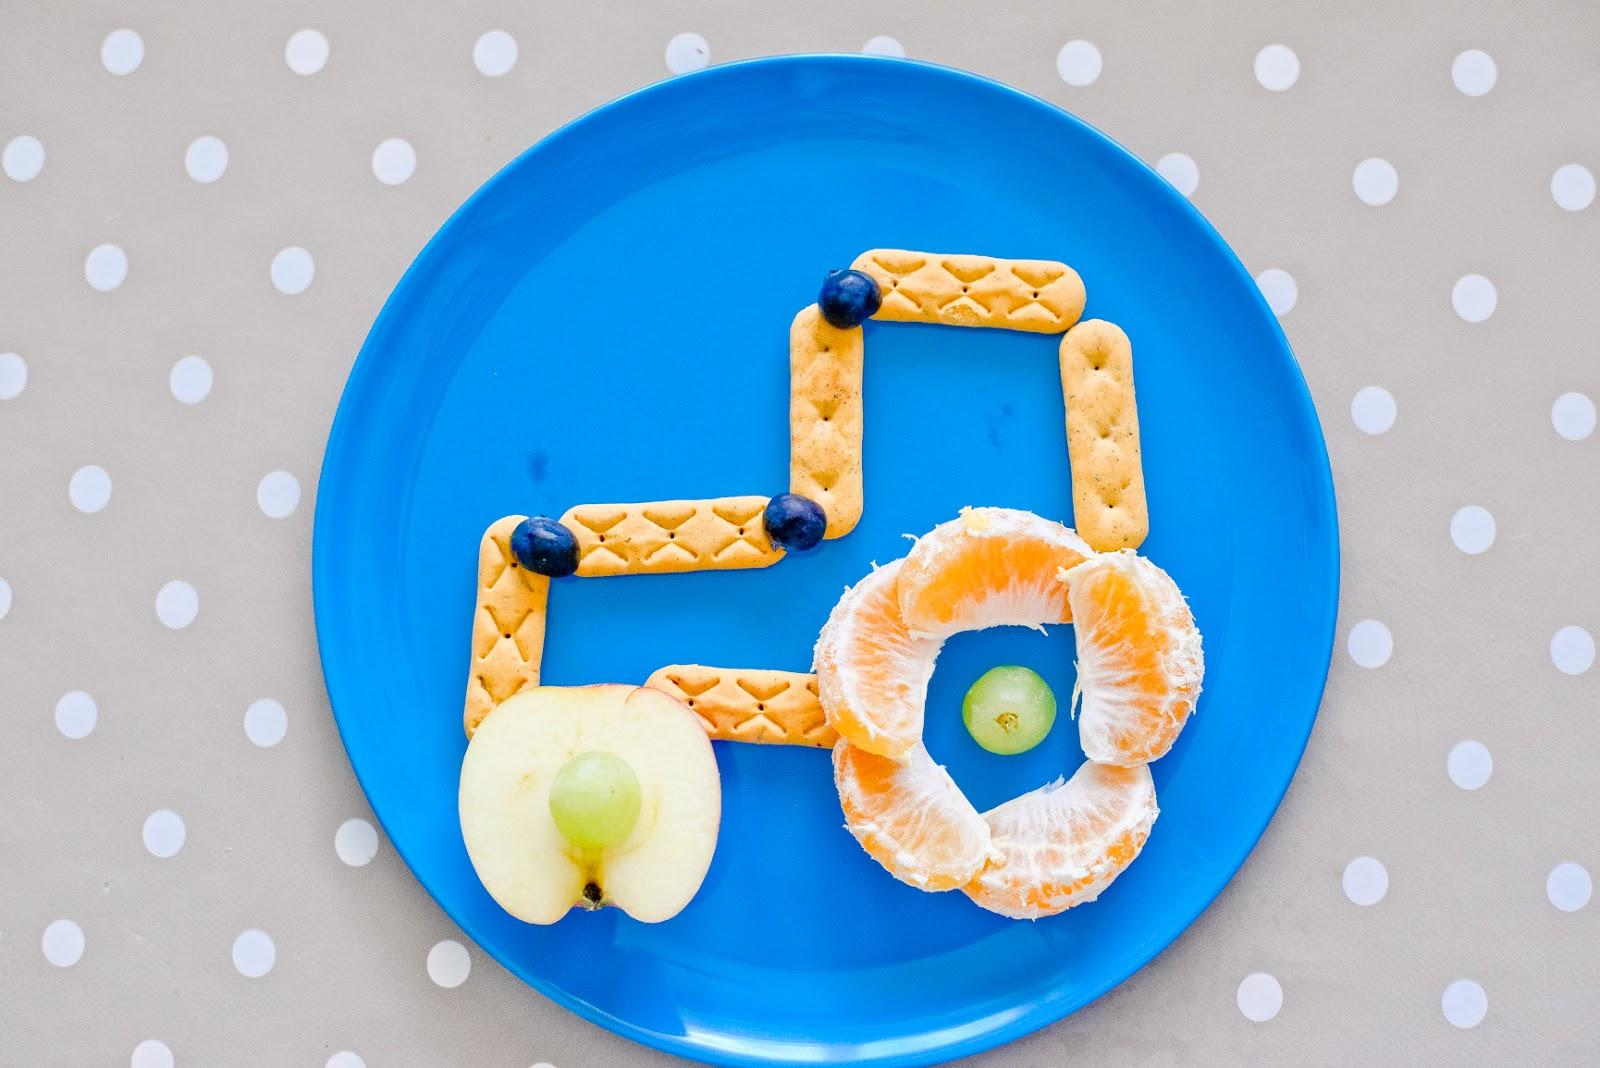 tractor snack idea, fun snack ideas for kids, toddler snack ideas, toddler snacks, healthy snacks for kids,